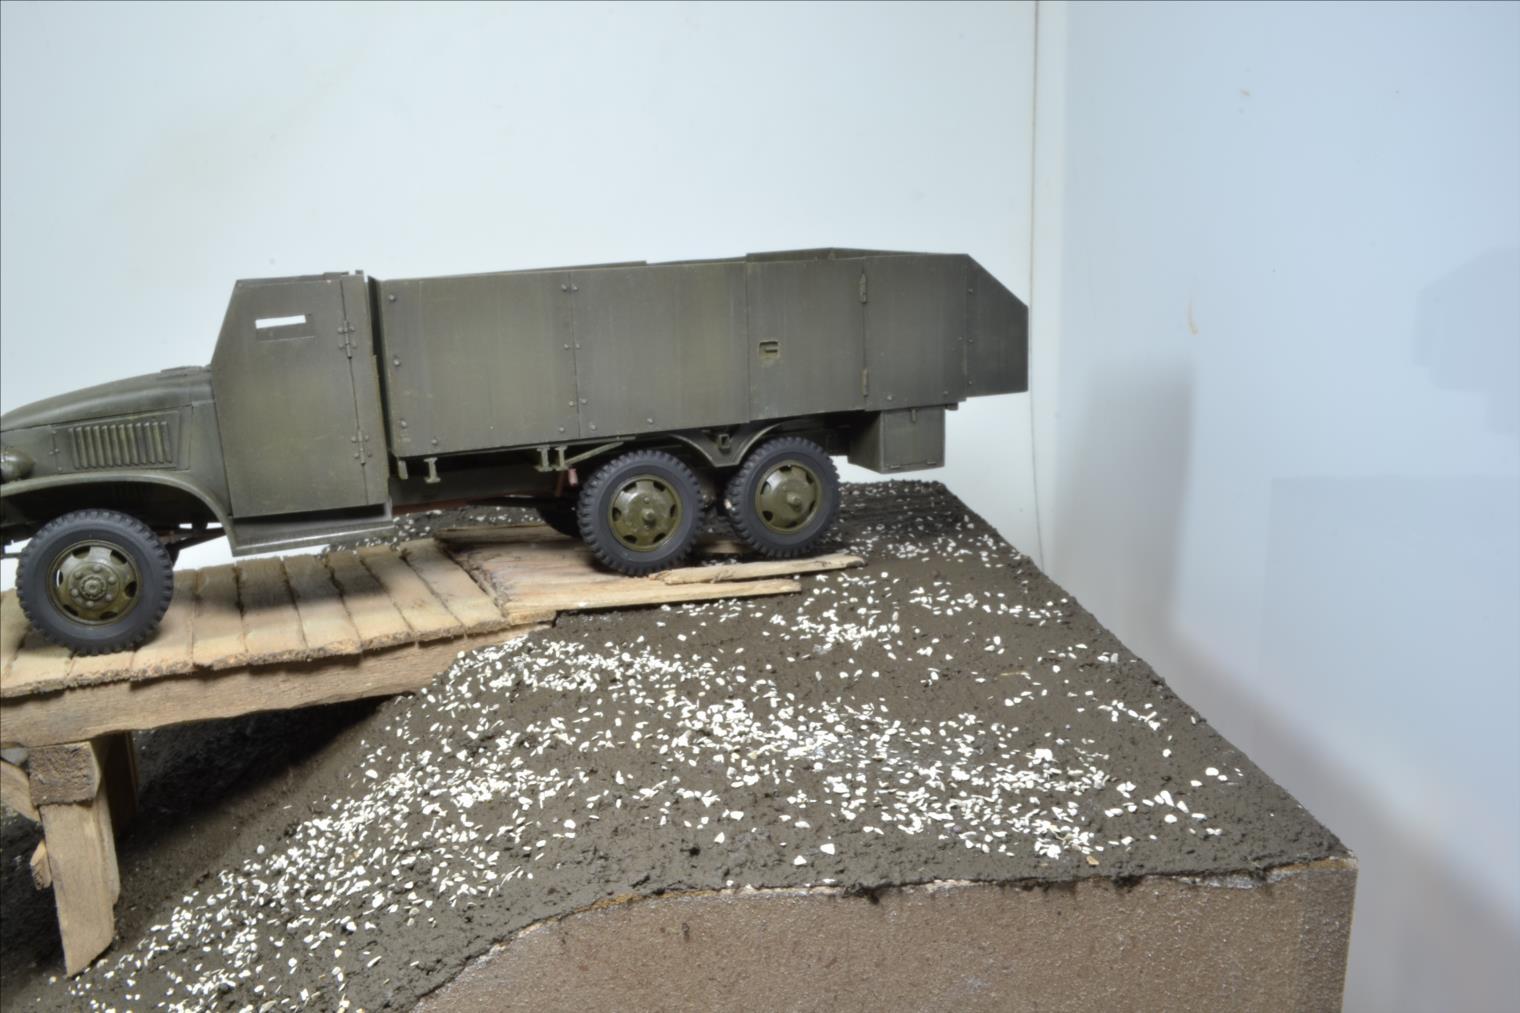 INDOCHINE GMC Bofors (Hobby Boss) 1/35 - Page 3 19122406305622494216571061